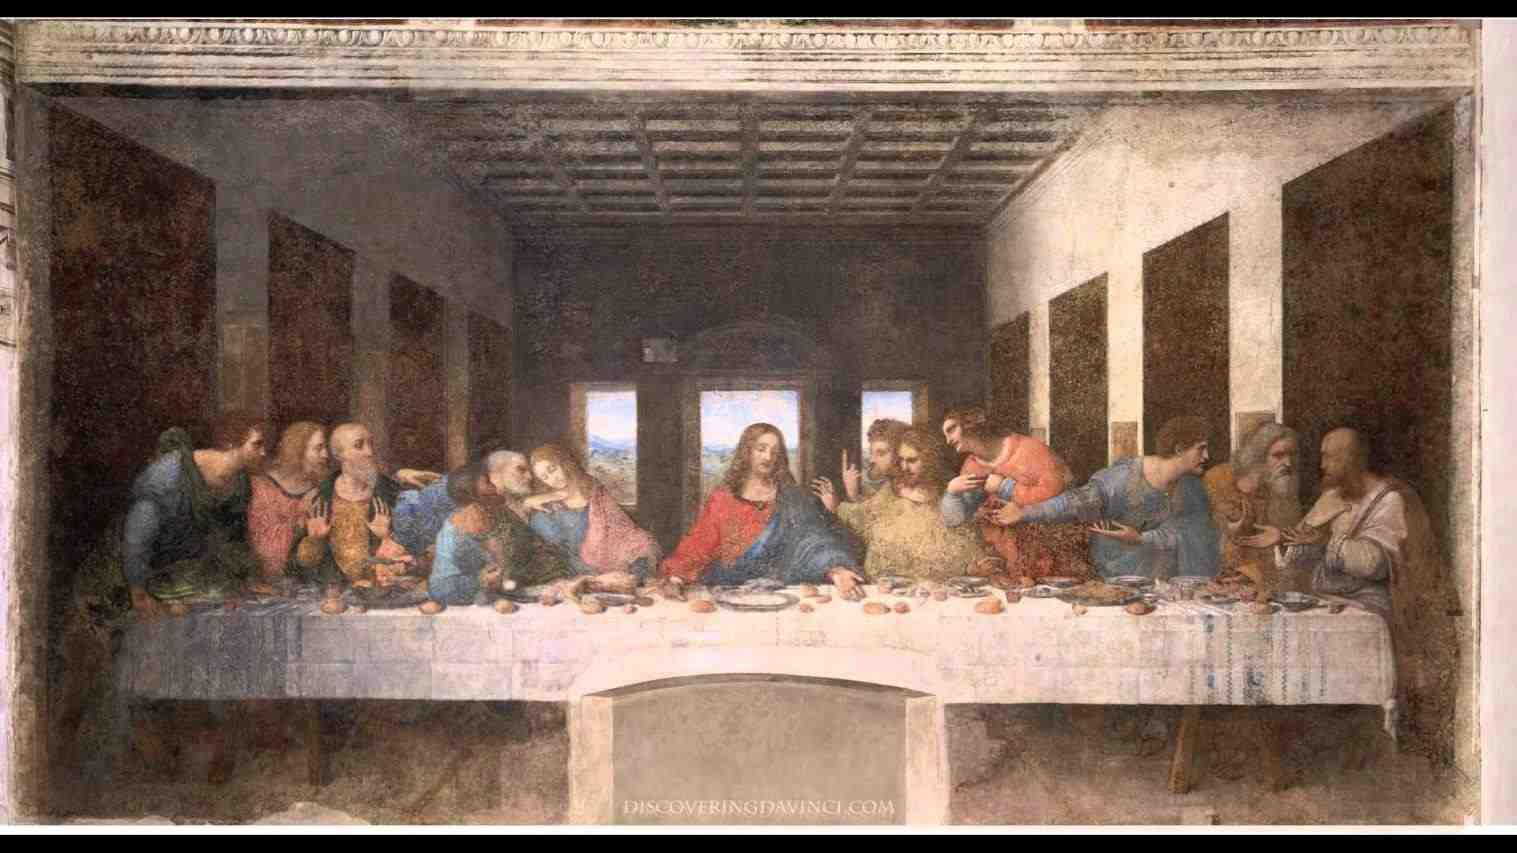 The Last Supper Original Painting By Leonardo Da Vinci Last Supper Painting Restoration 1190583 Hd Wallpaper Backgrounds Download